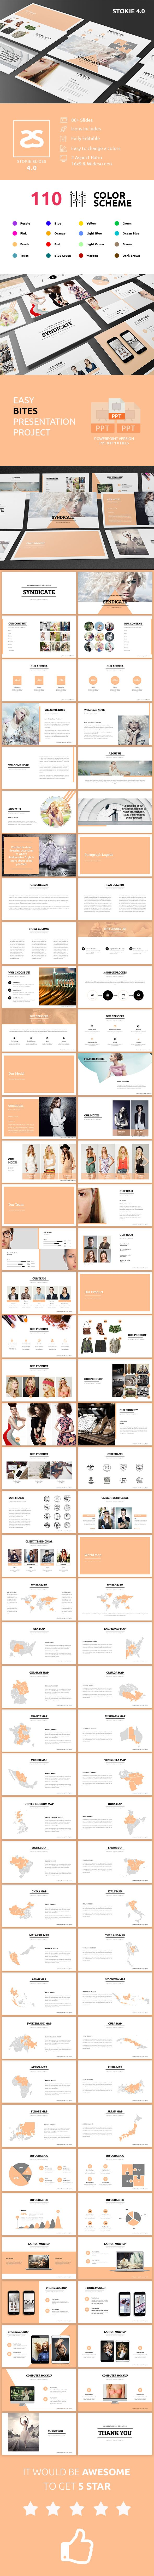 2323 best powerpoint template images on pinterest presentation fashion powerpoint template 40 toneelgroepblik Images